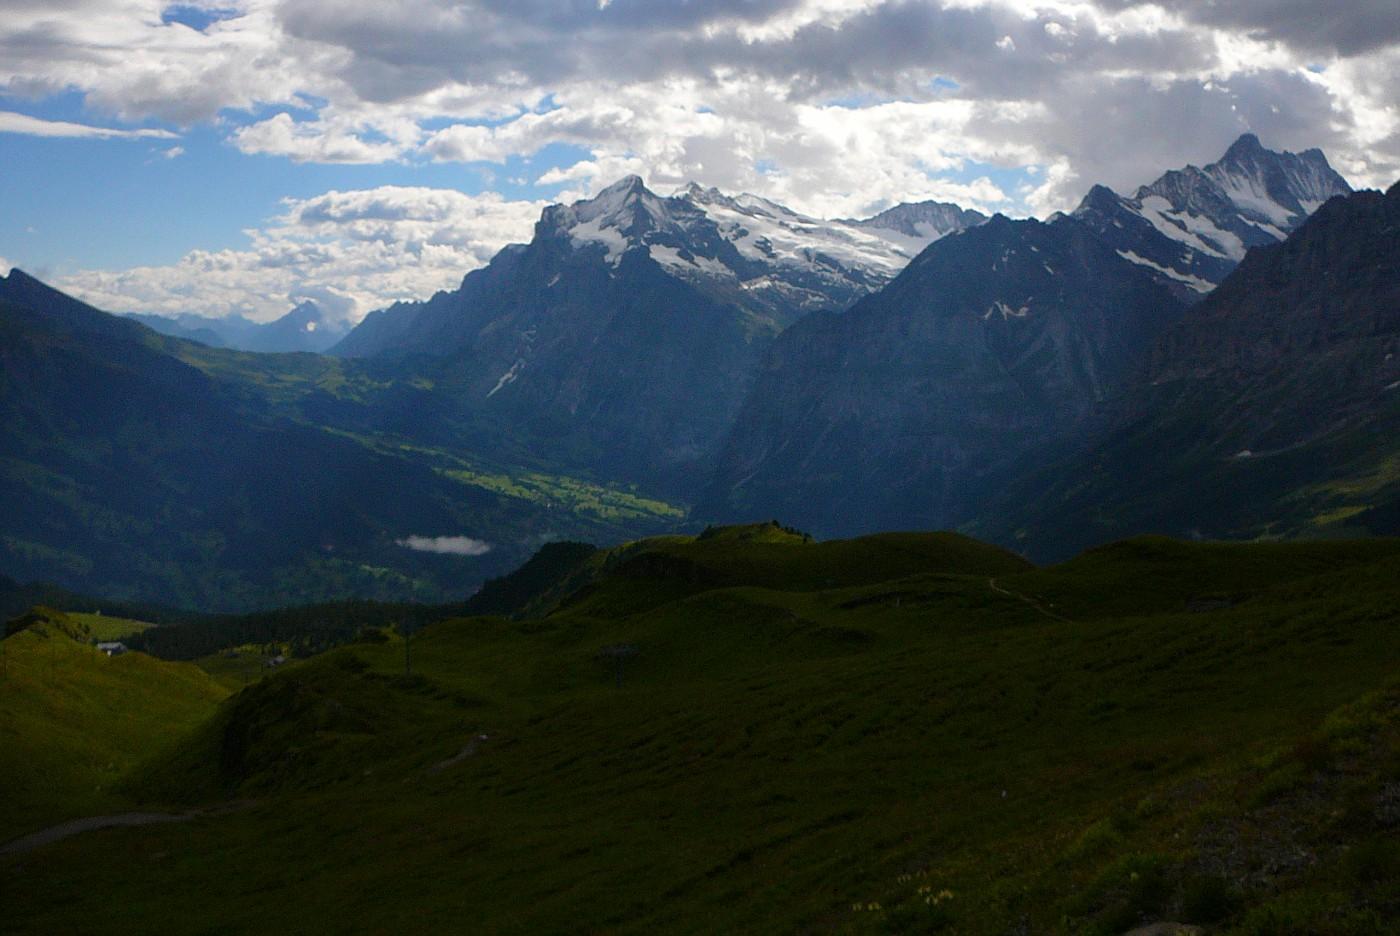 Peaks part of Eiger Mountain Range - Near Interlaken